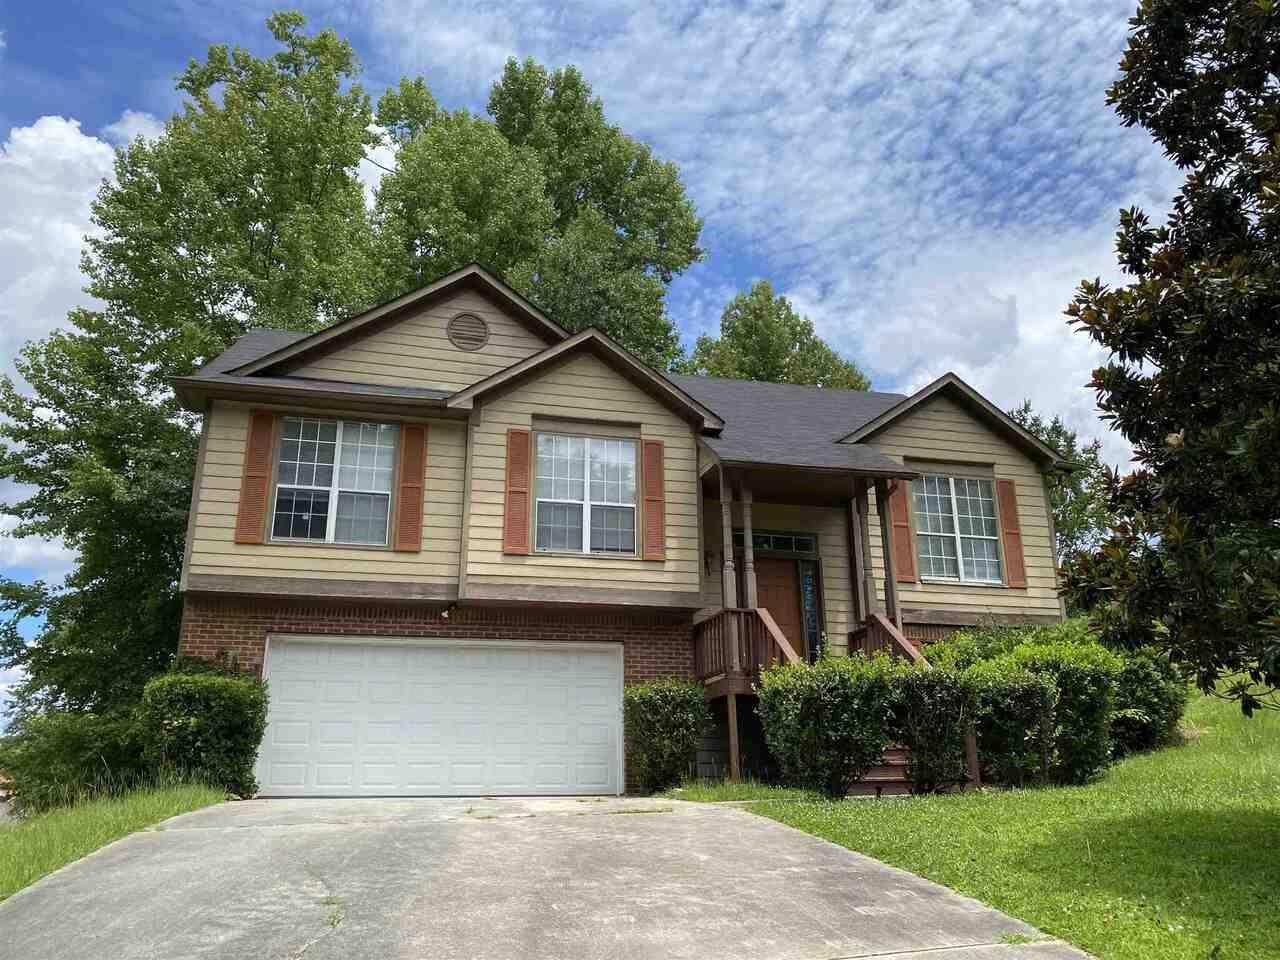 992 Romer Place, Stone Mountain, GA 30083 - #: 9017794